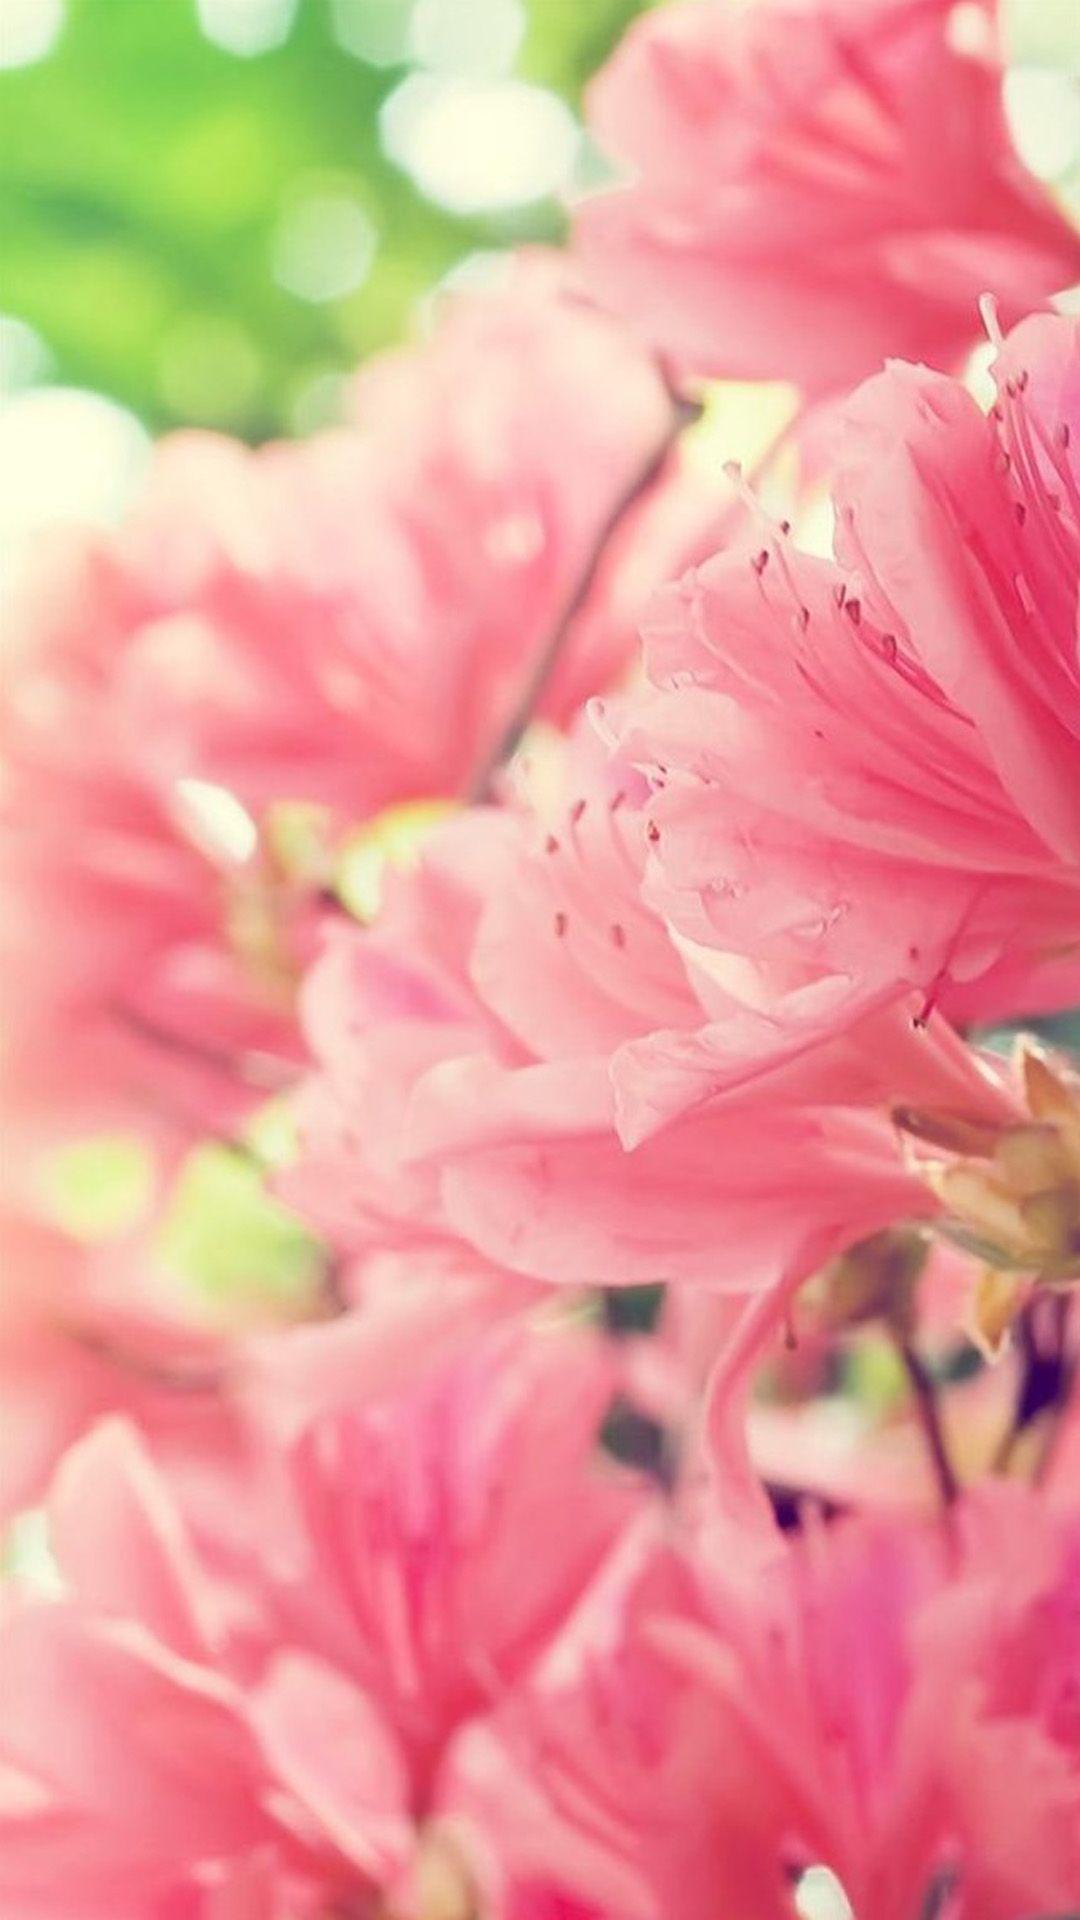 Cute Roses Wallpapers Download Beautiful Spring Wallpapers For Iphone Pixelstalk Net